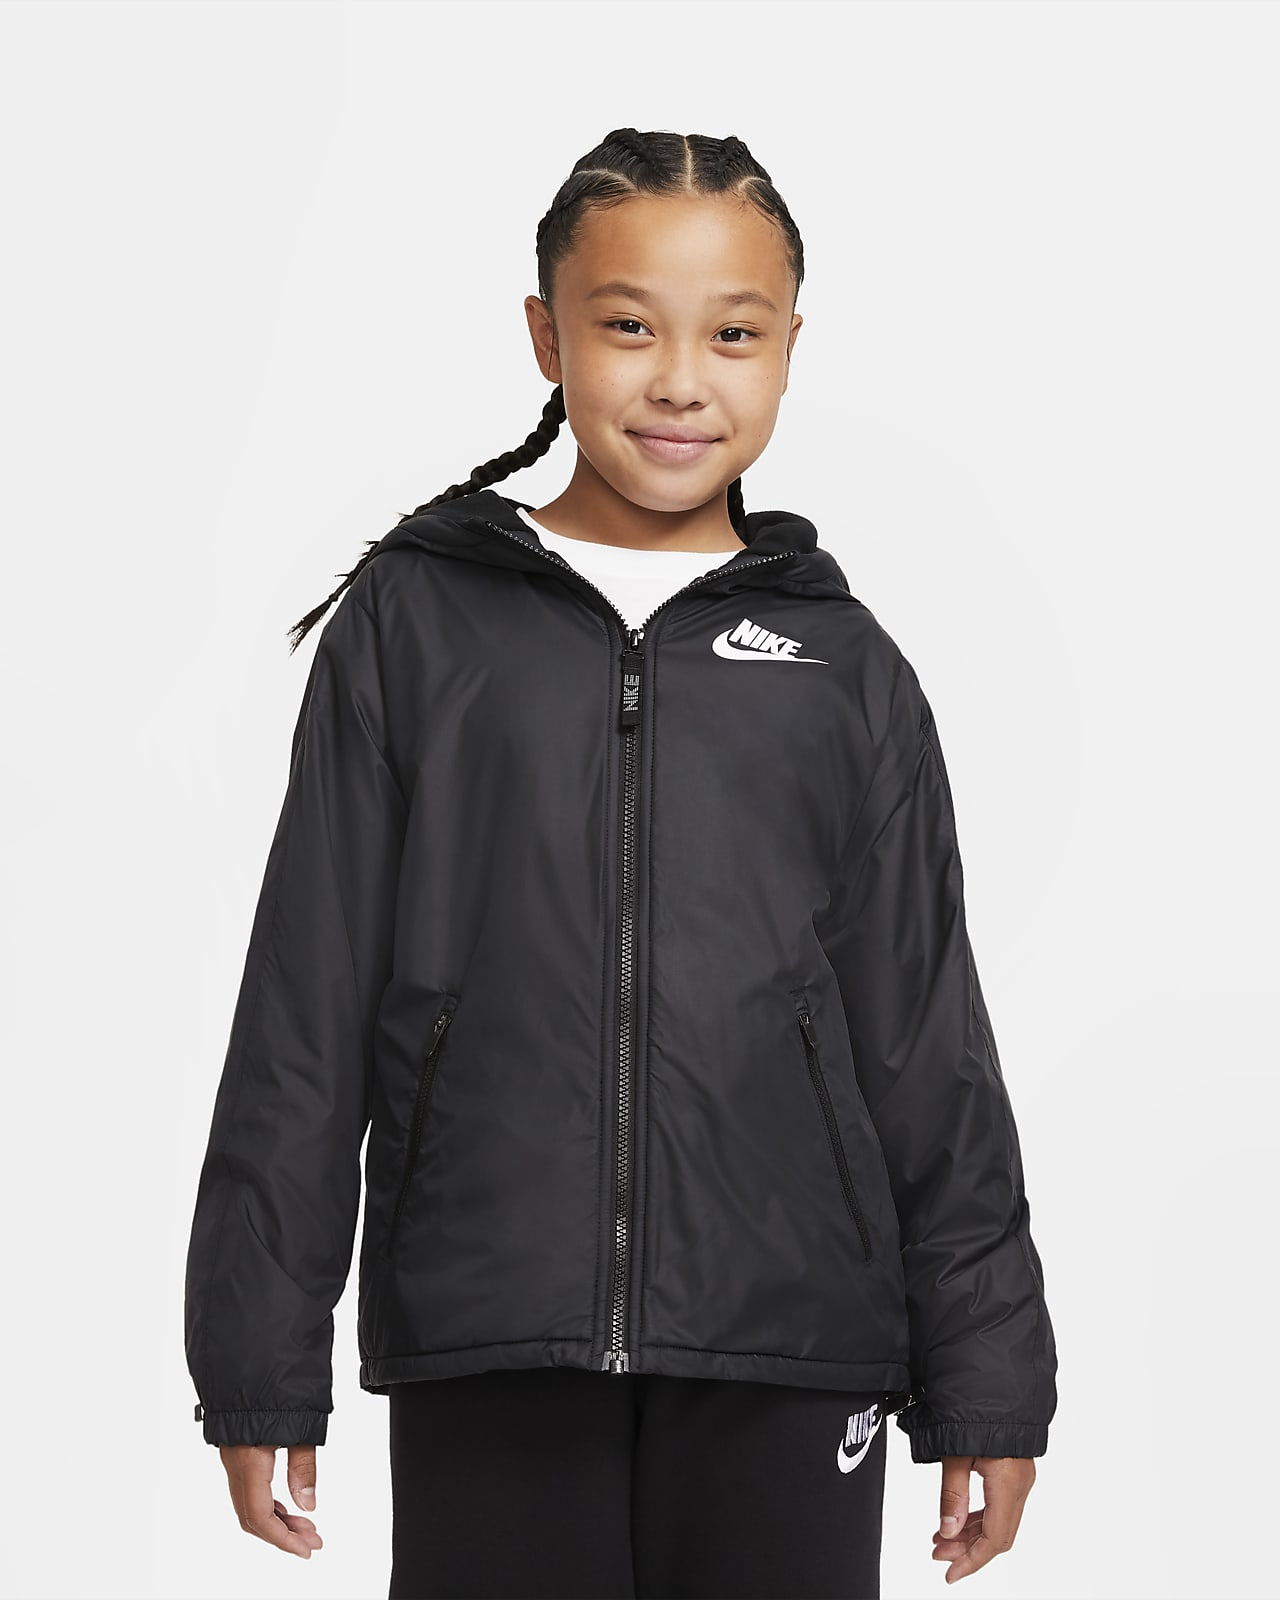 Nike Sportswear Jack met fleecevoering voor kids